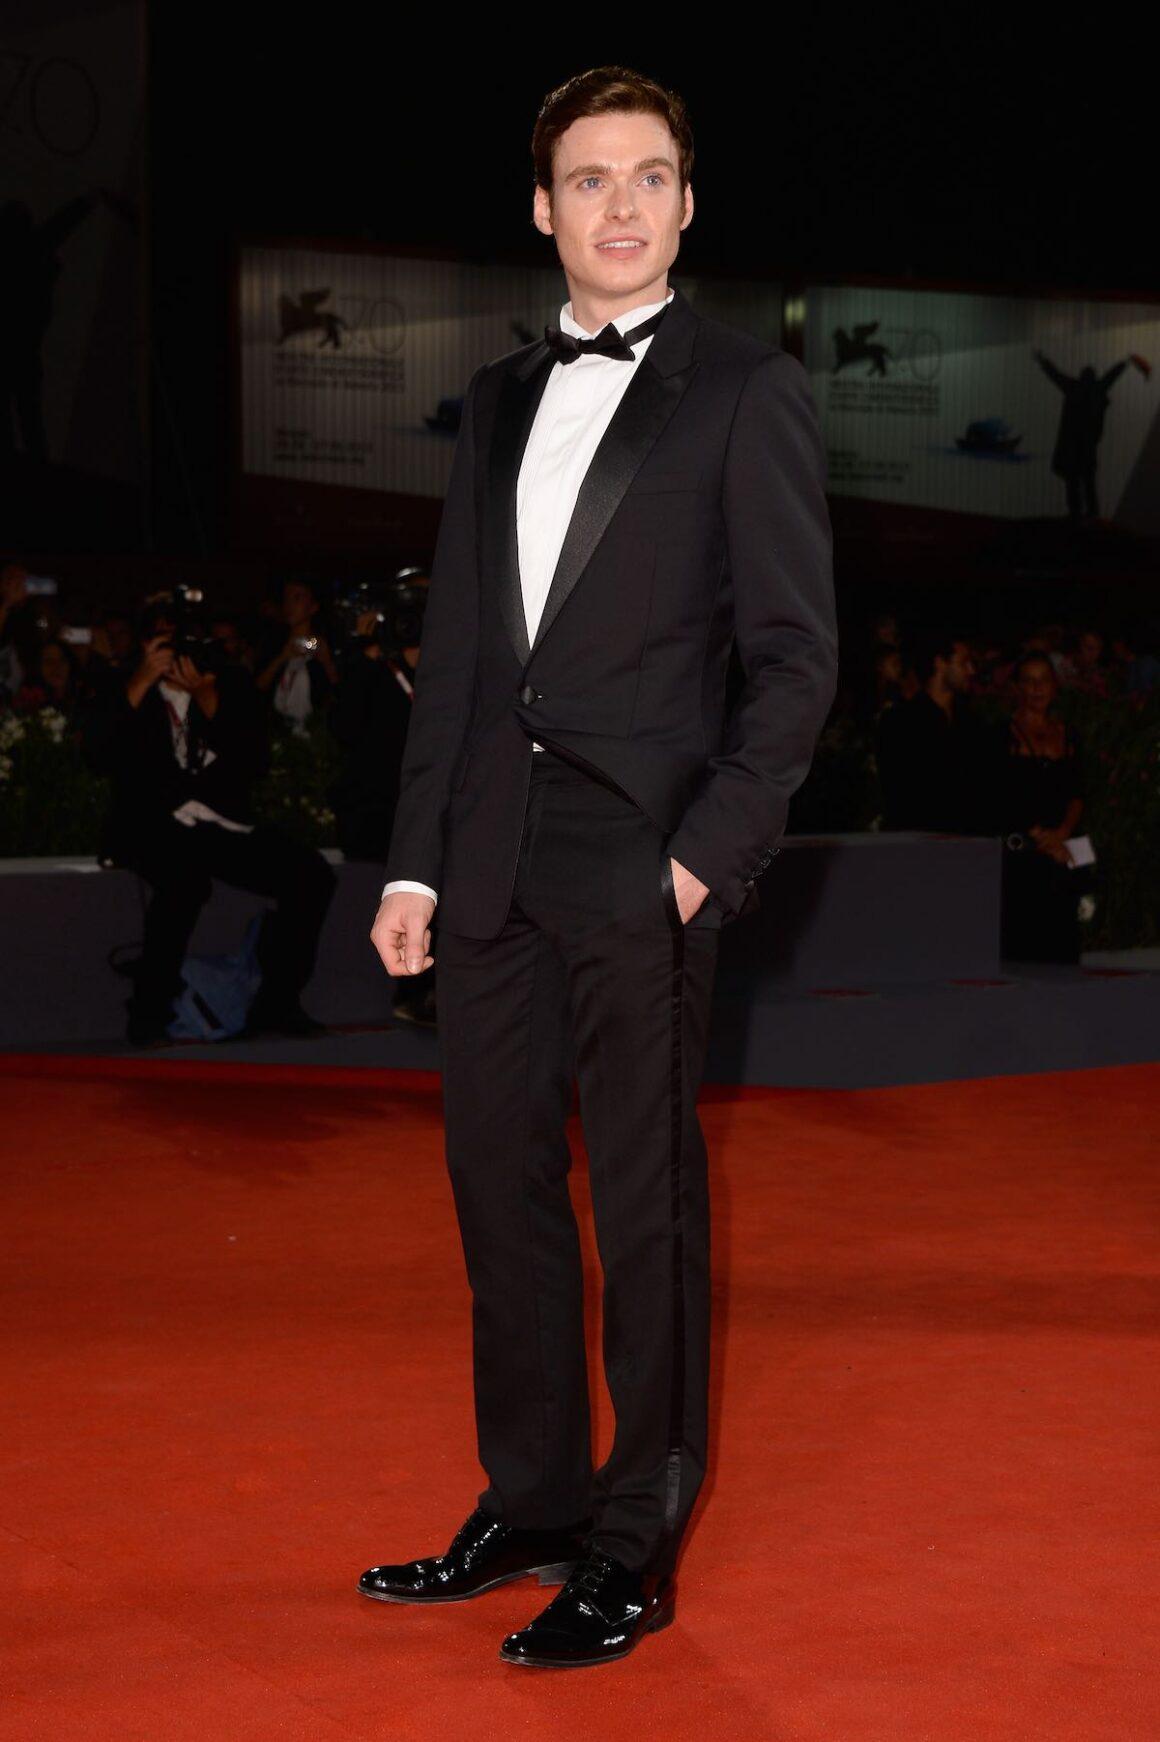 Richard Madden 'Une Promesse' Premiere - The 70th Venice International Film Festival